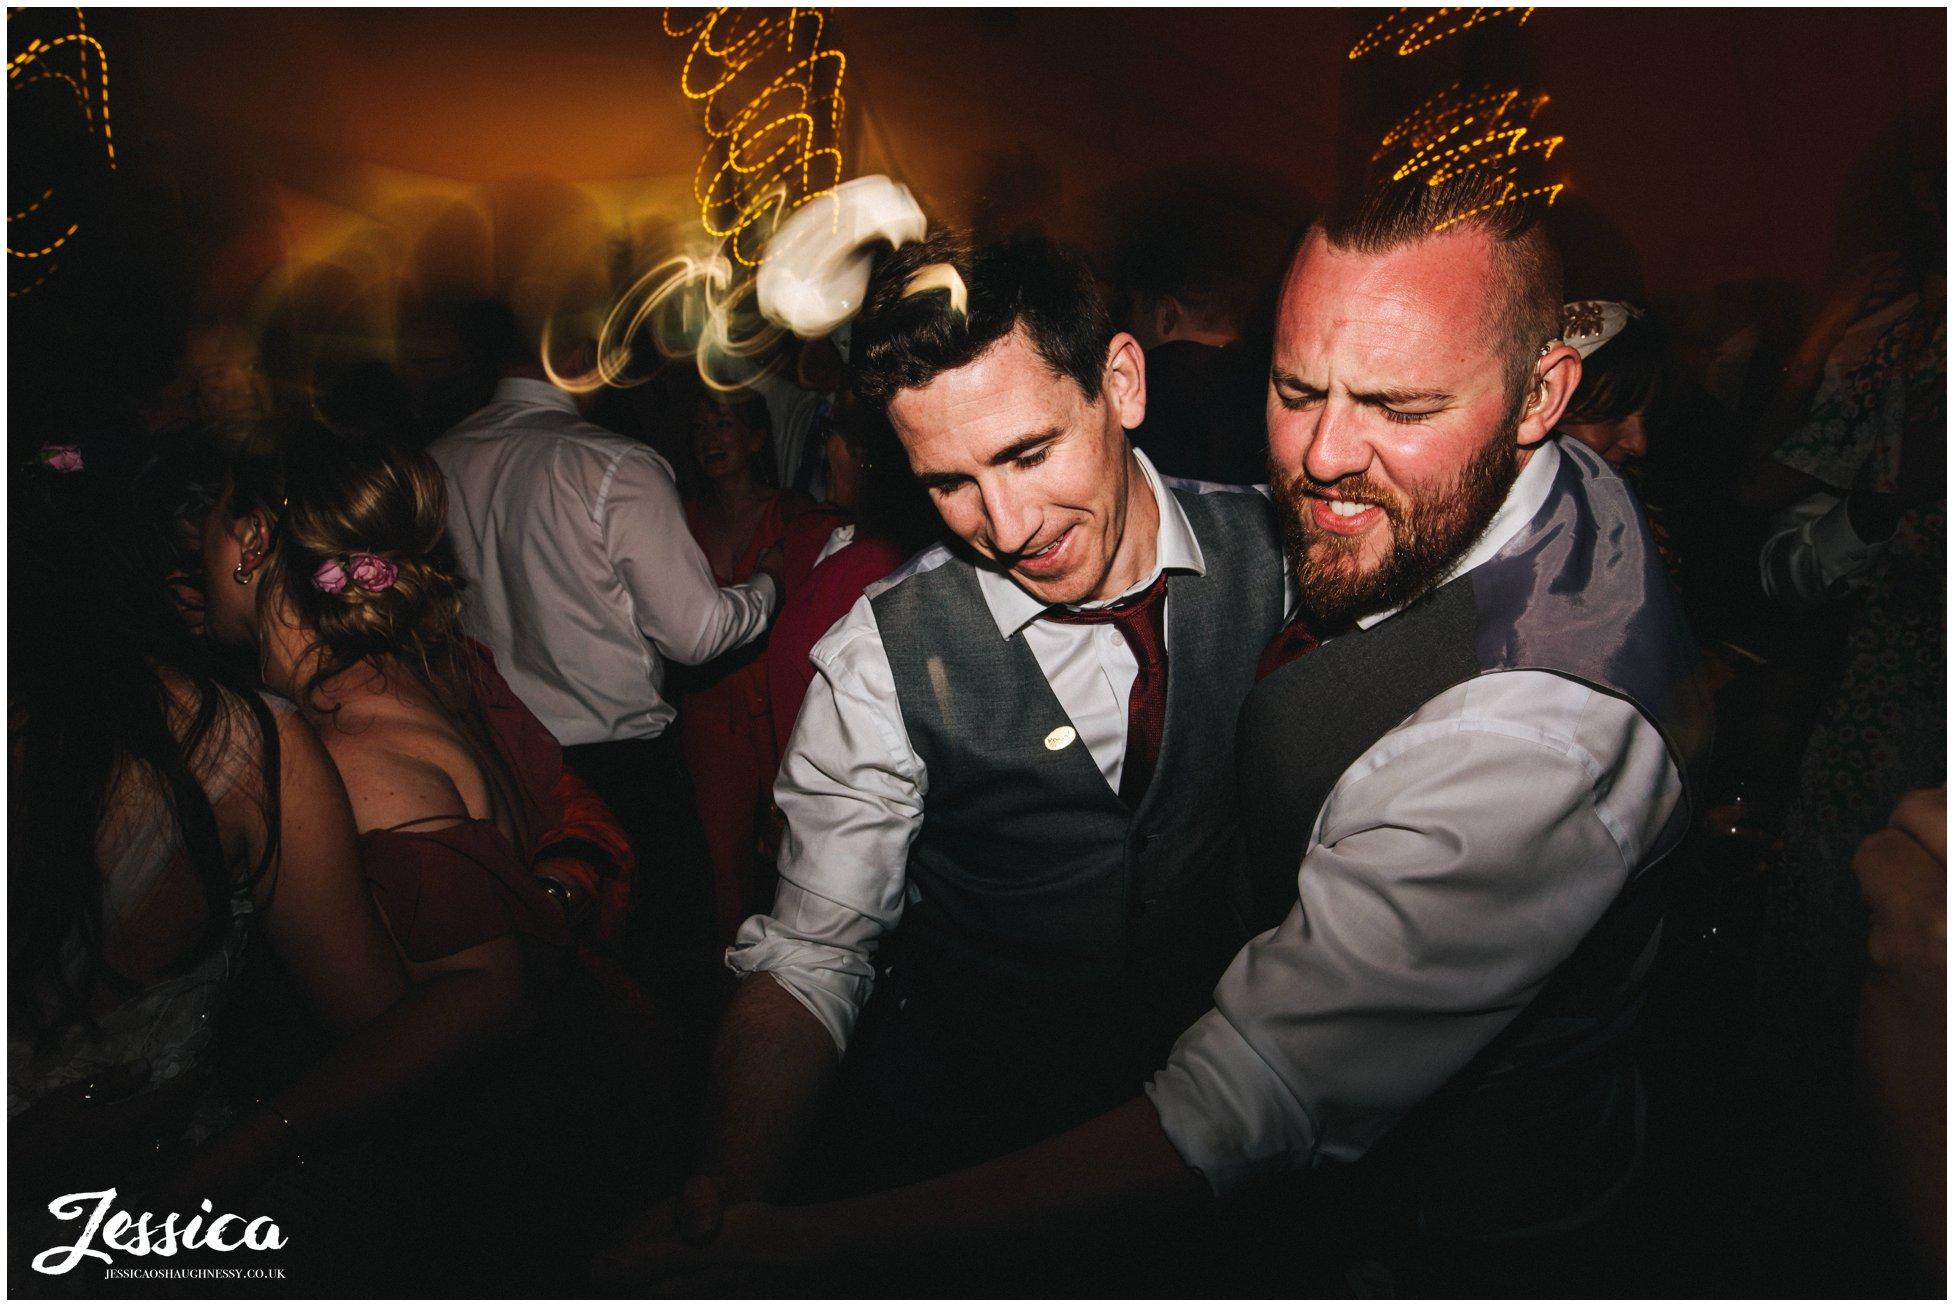 groomsmen dance together at the tipi wedding